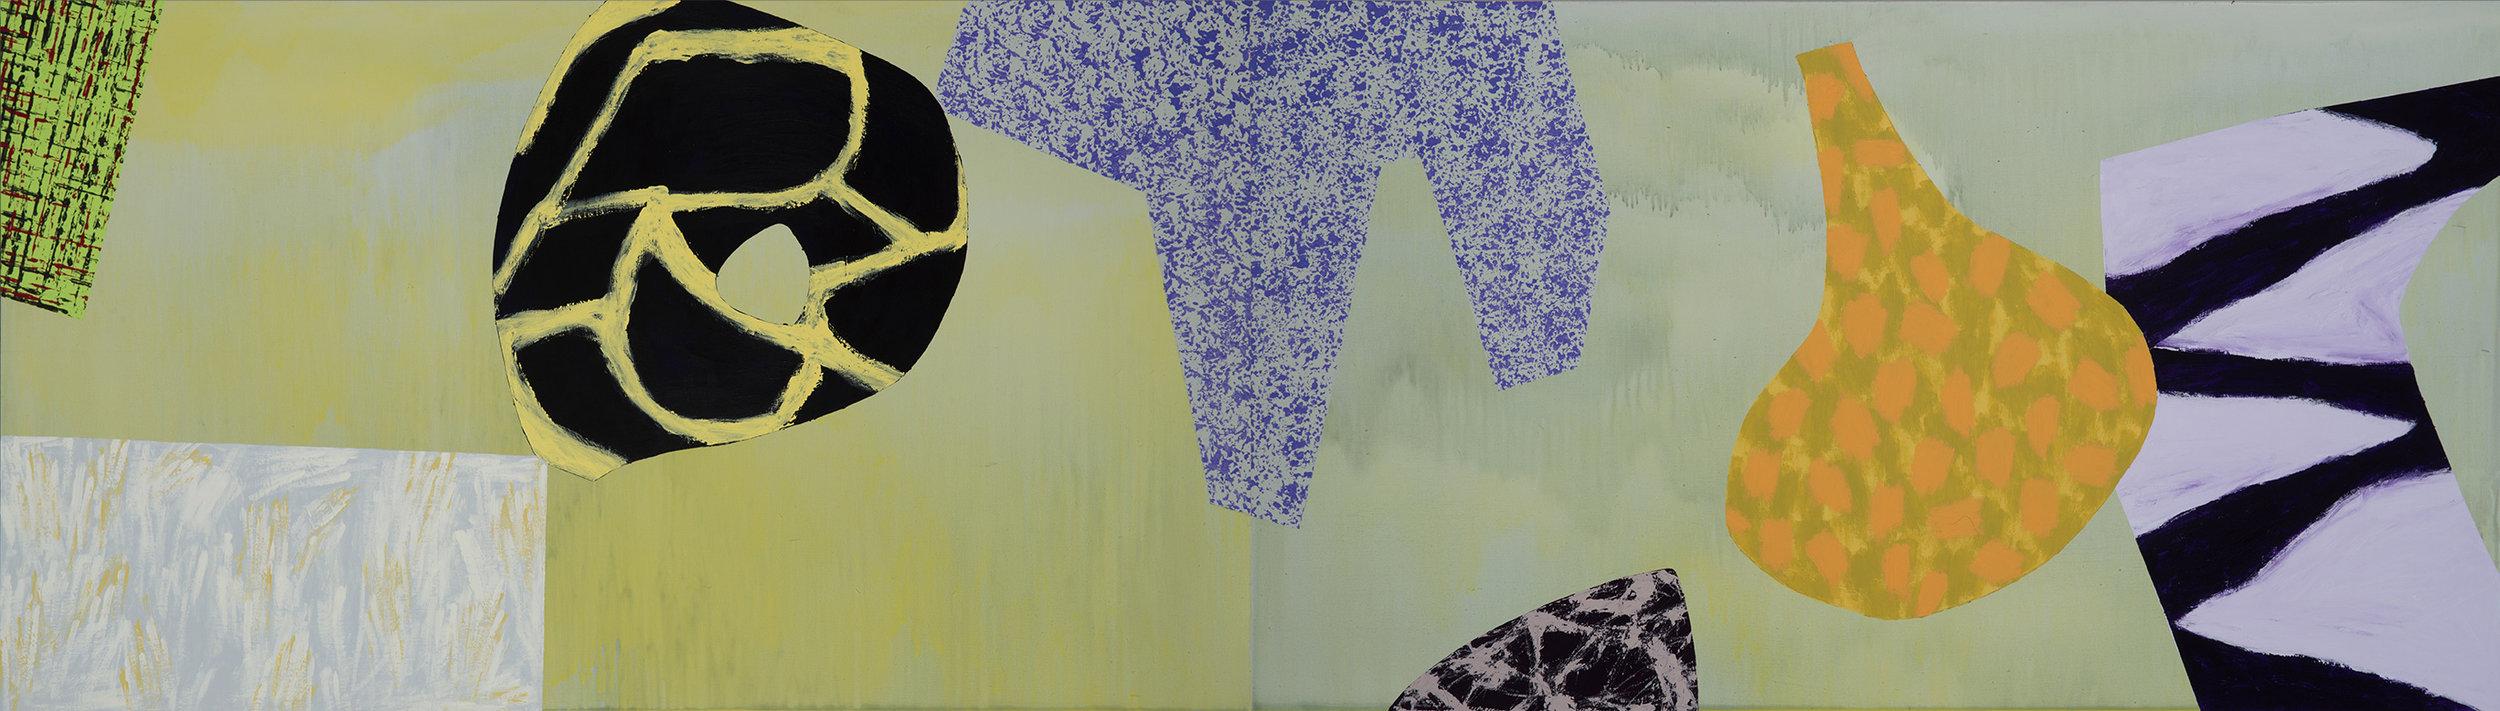 "Modern Dance / 7   Jerrold Burchman  BU289  Acrylic on Wood Panel  24"" x 48"""